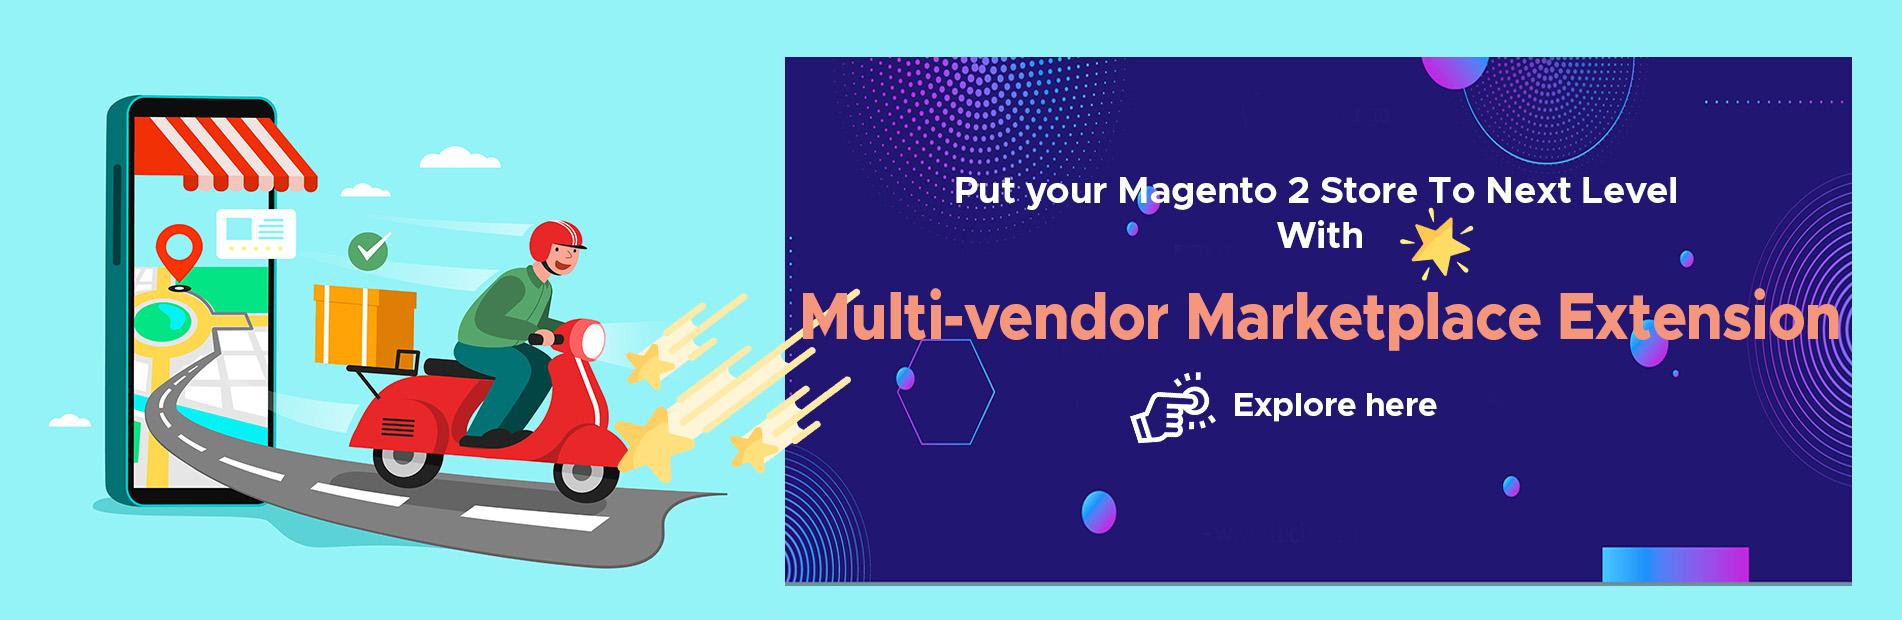 Magento 2 Marketplace - Multi Vendor Extension